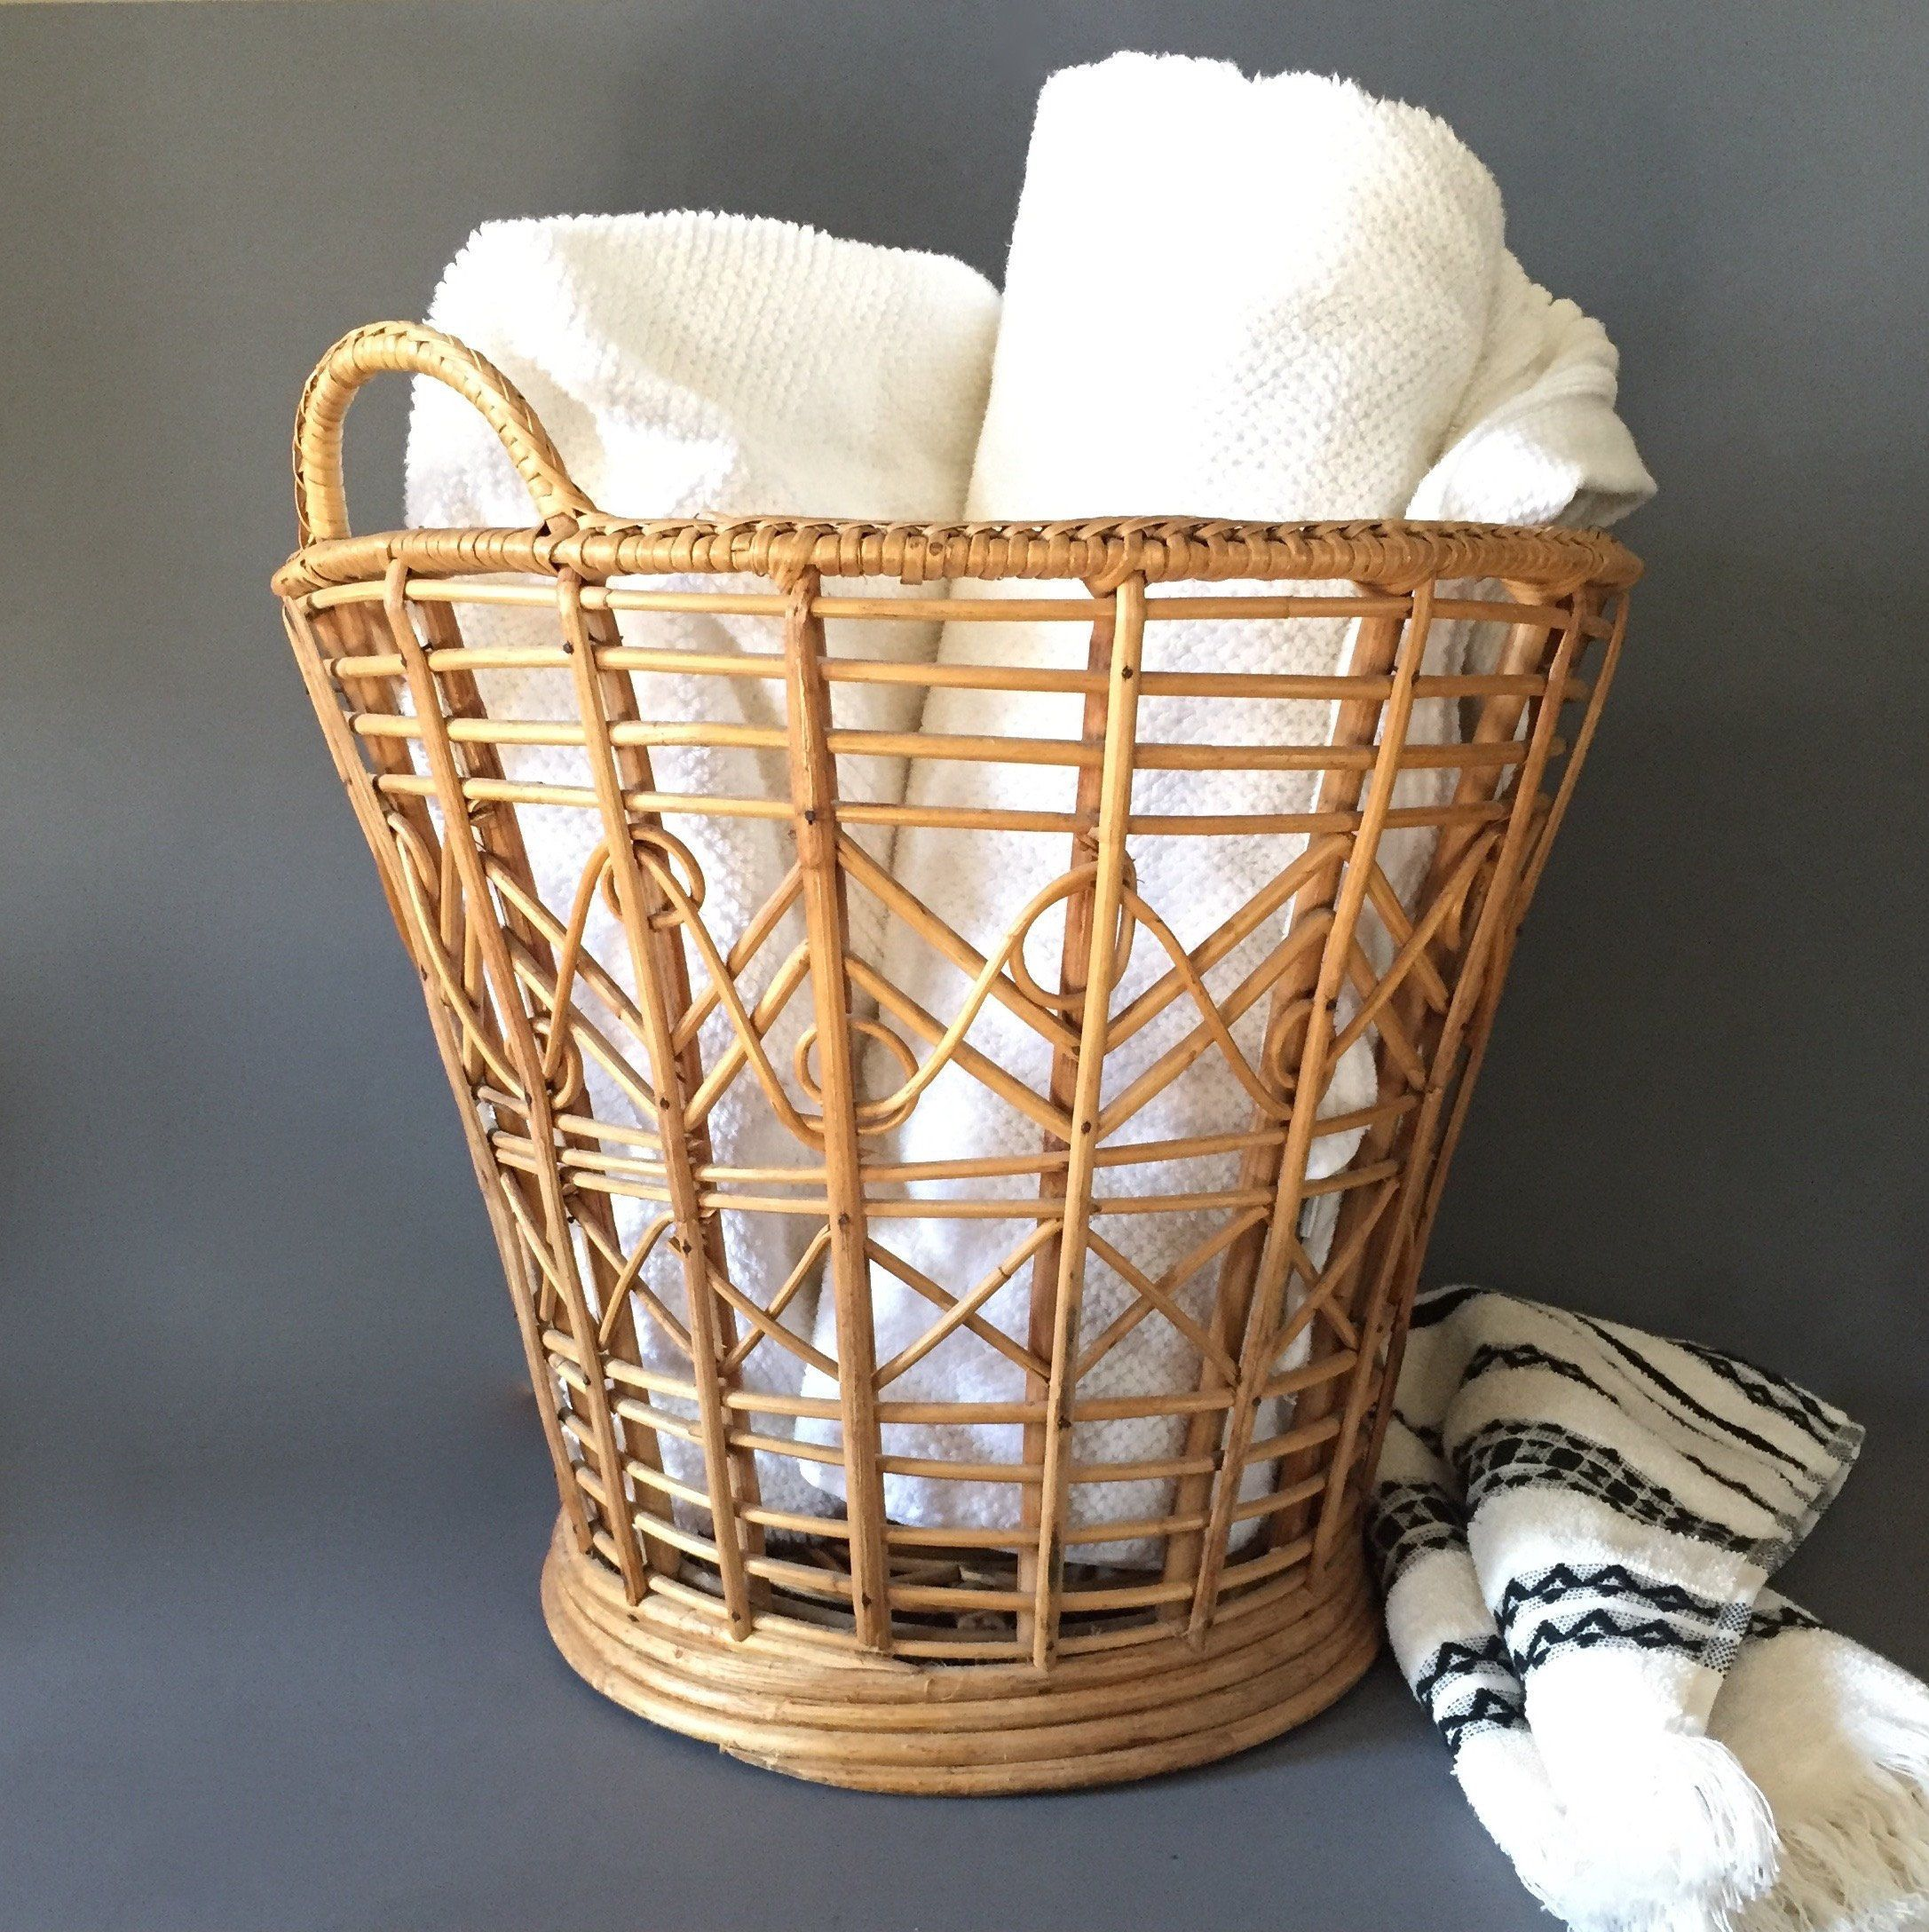 Plant Basket Towel Holder Boho Decor Towel Holder Boho Decor Plant Basket